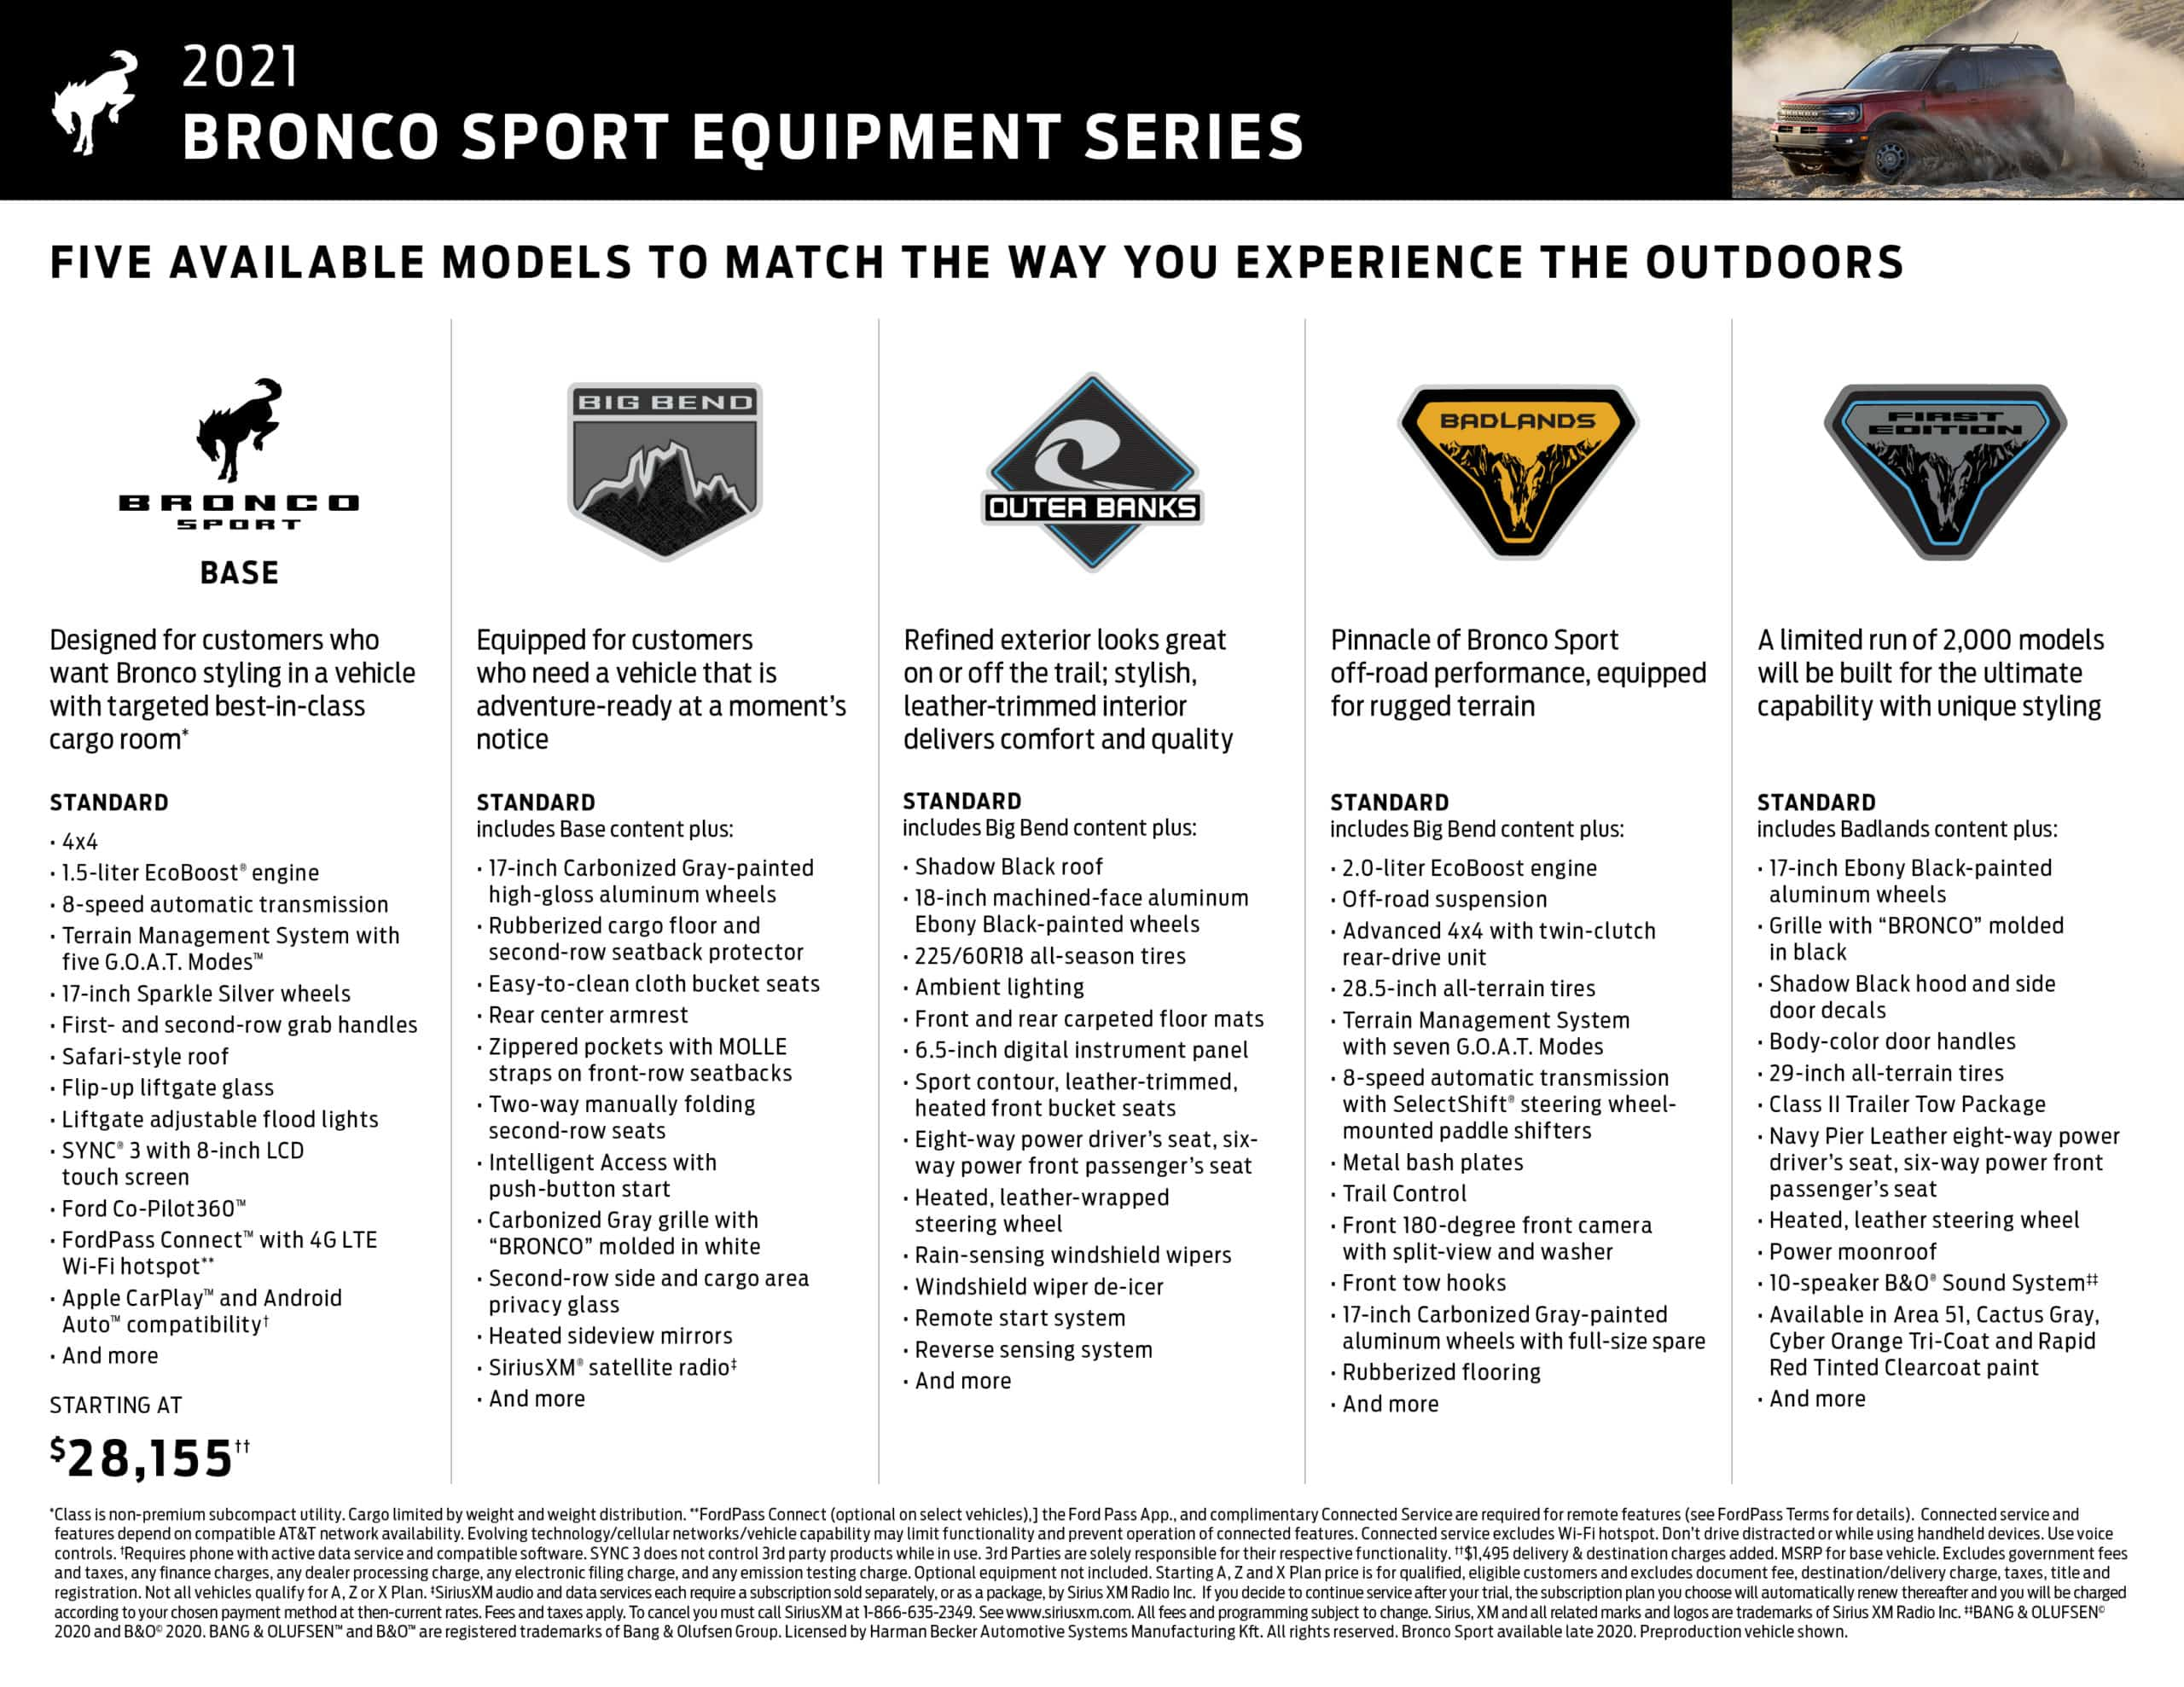 2021 Ford Bronco Sport model specs